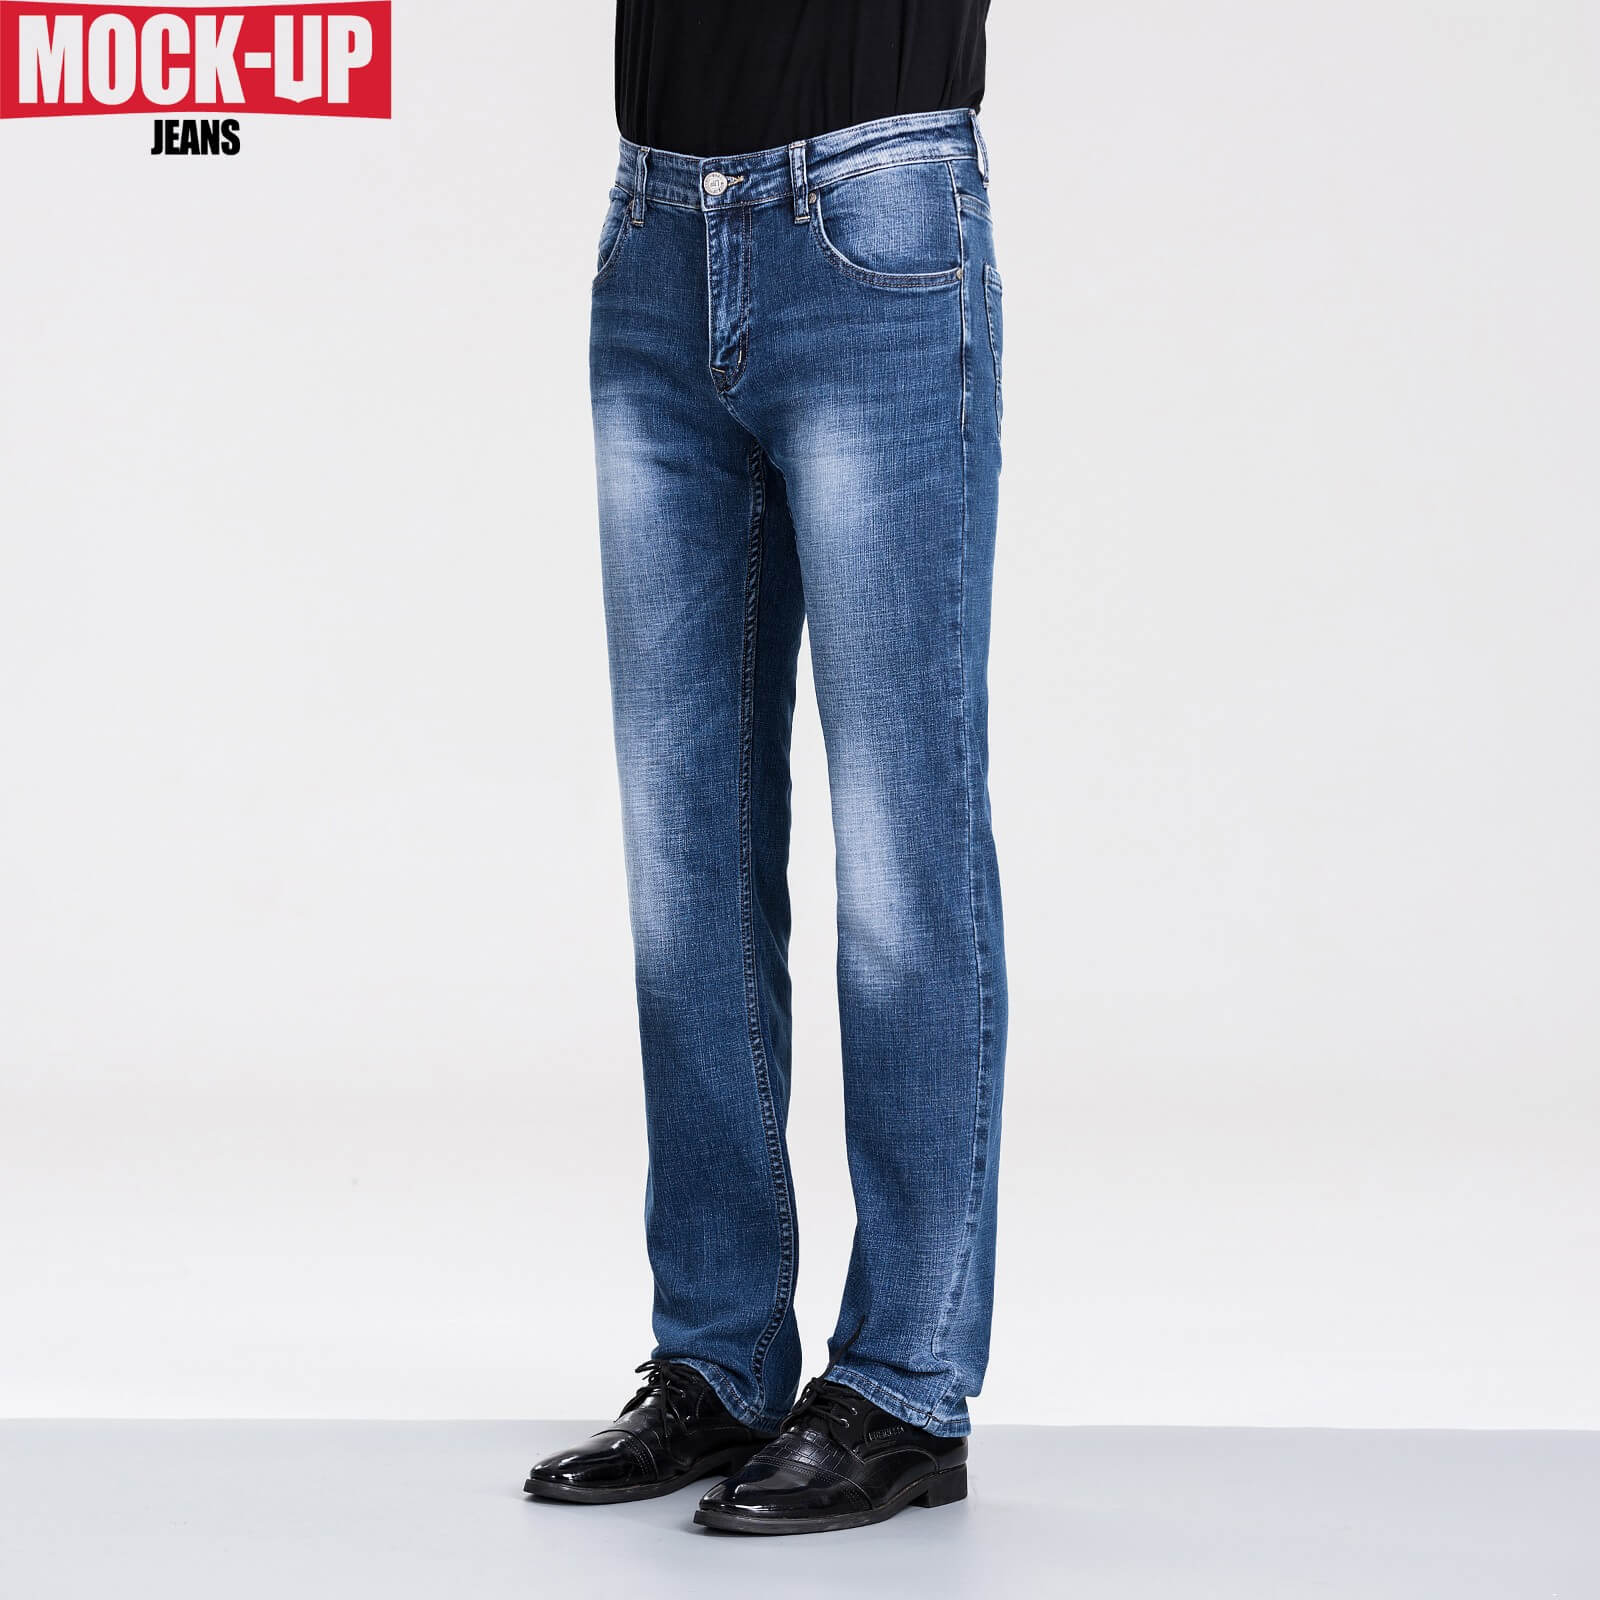 Mock Up Brand 2019 Skinny Jeans Men Denim Pants Male Mid Weight Men Casual Biker Denim Jeans PLUS Size 29-40 Desquared2 Hot Sell